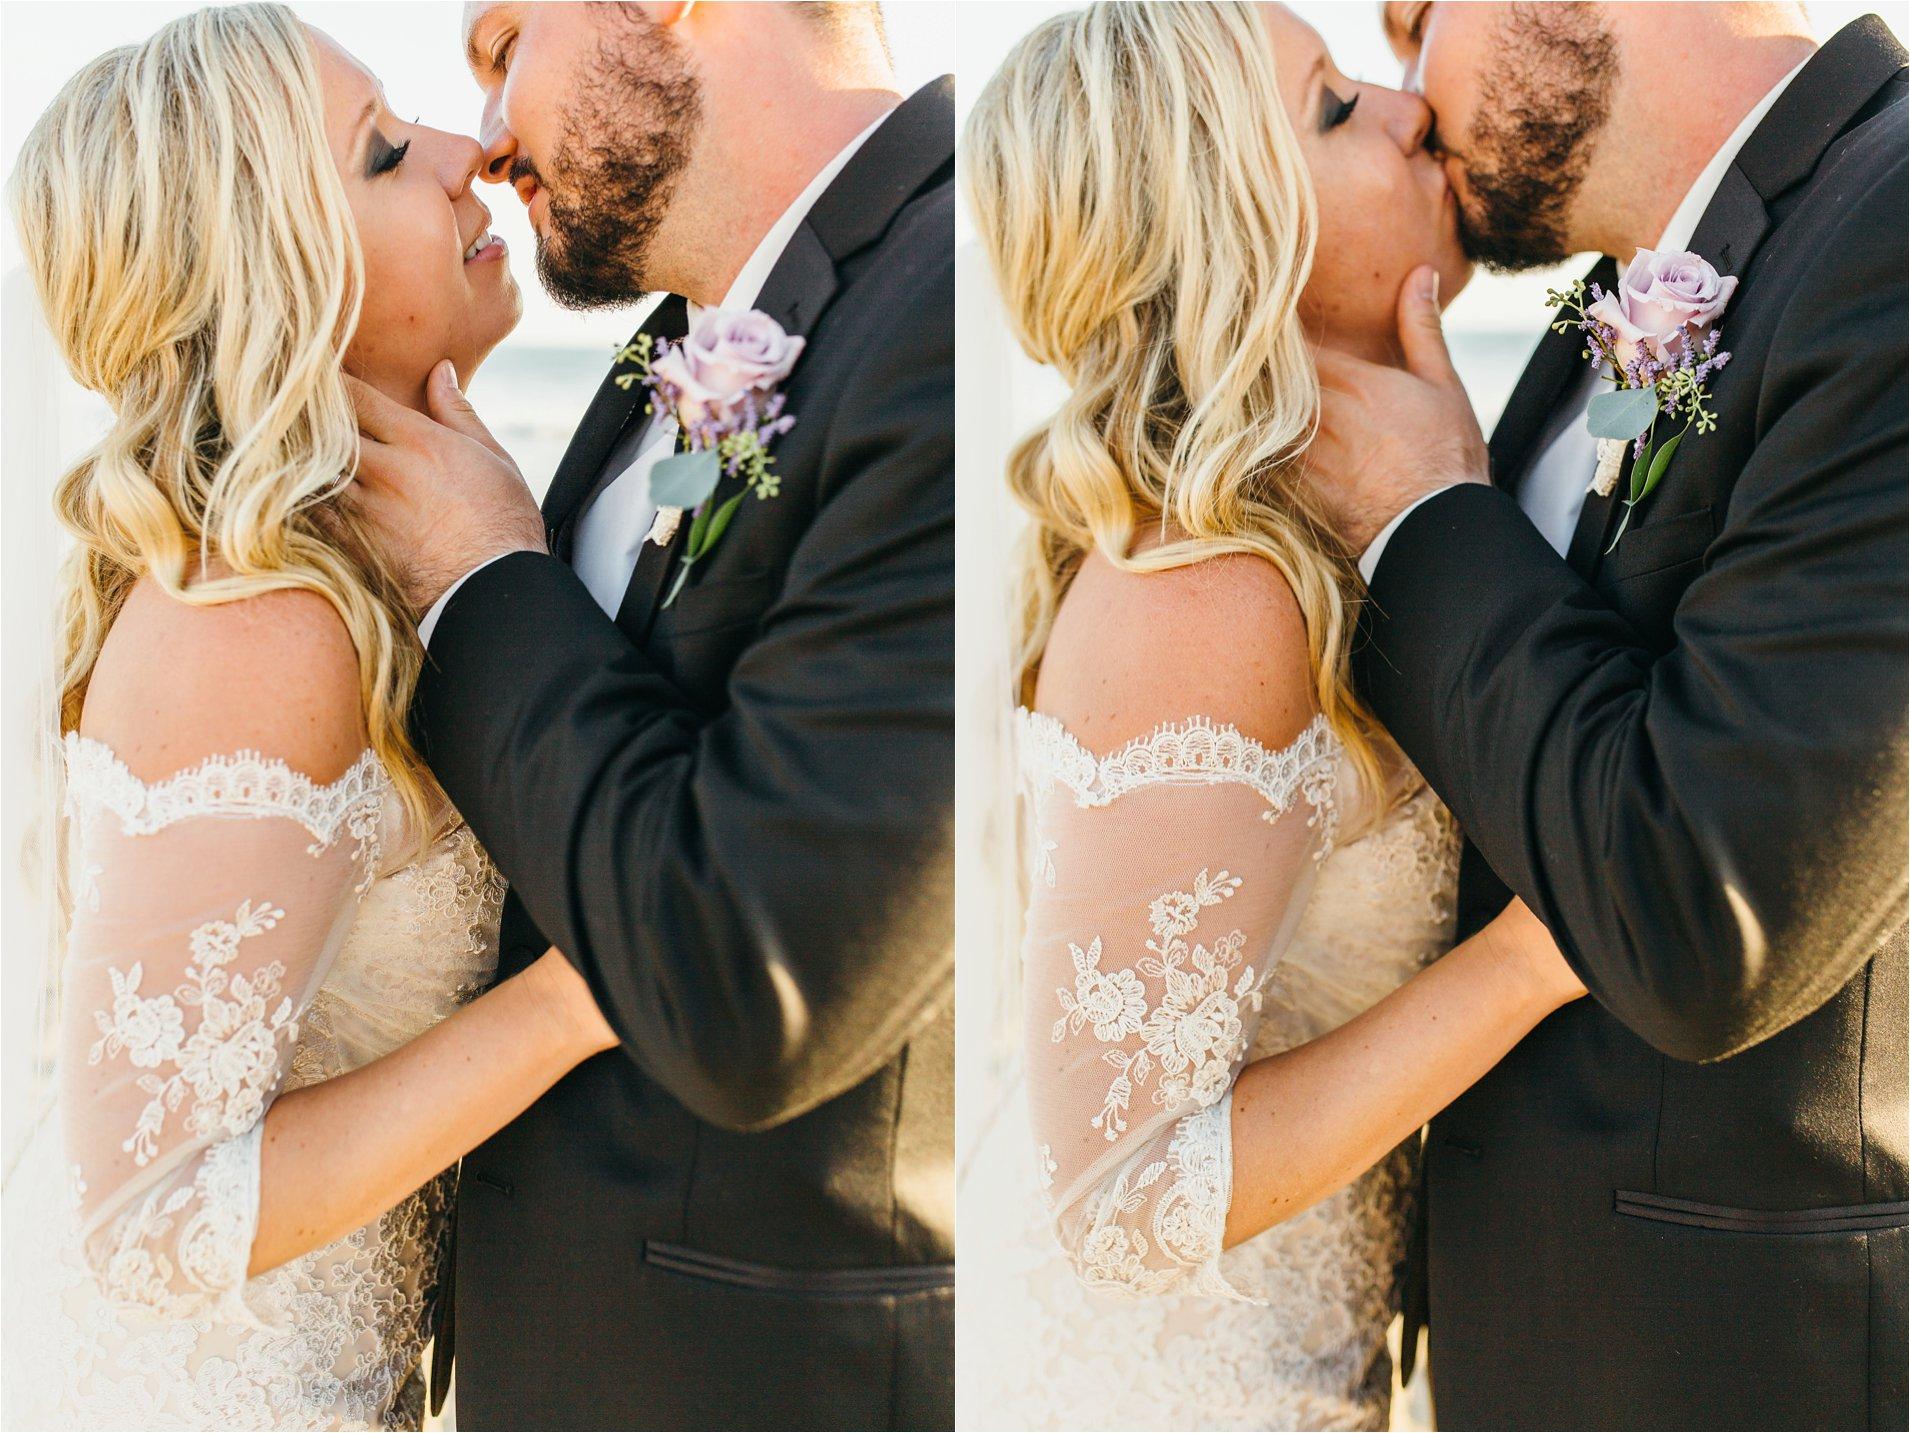 Wedding photos on the beach in San Clemente